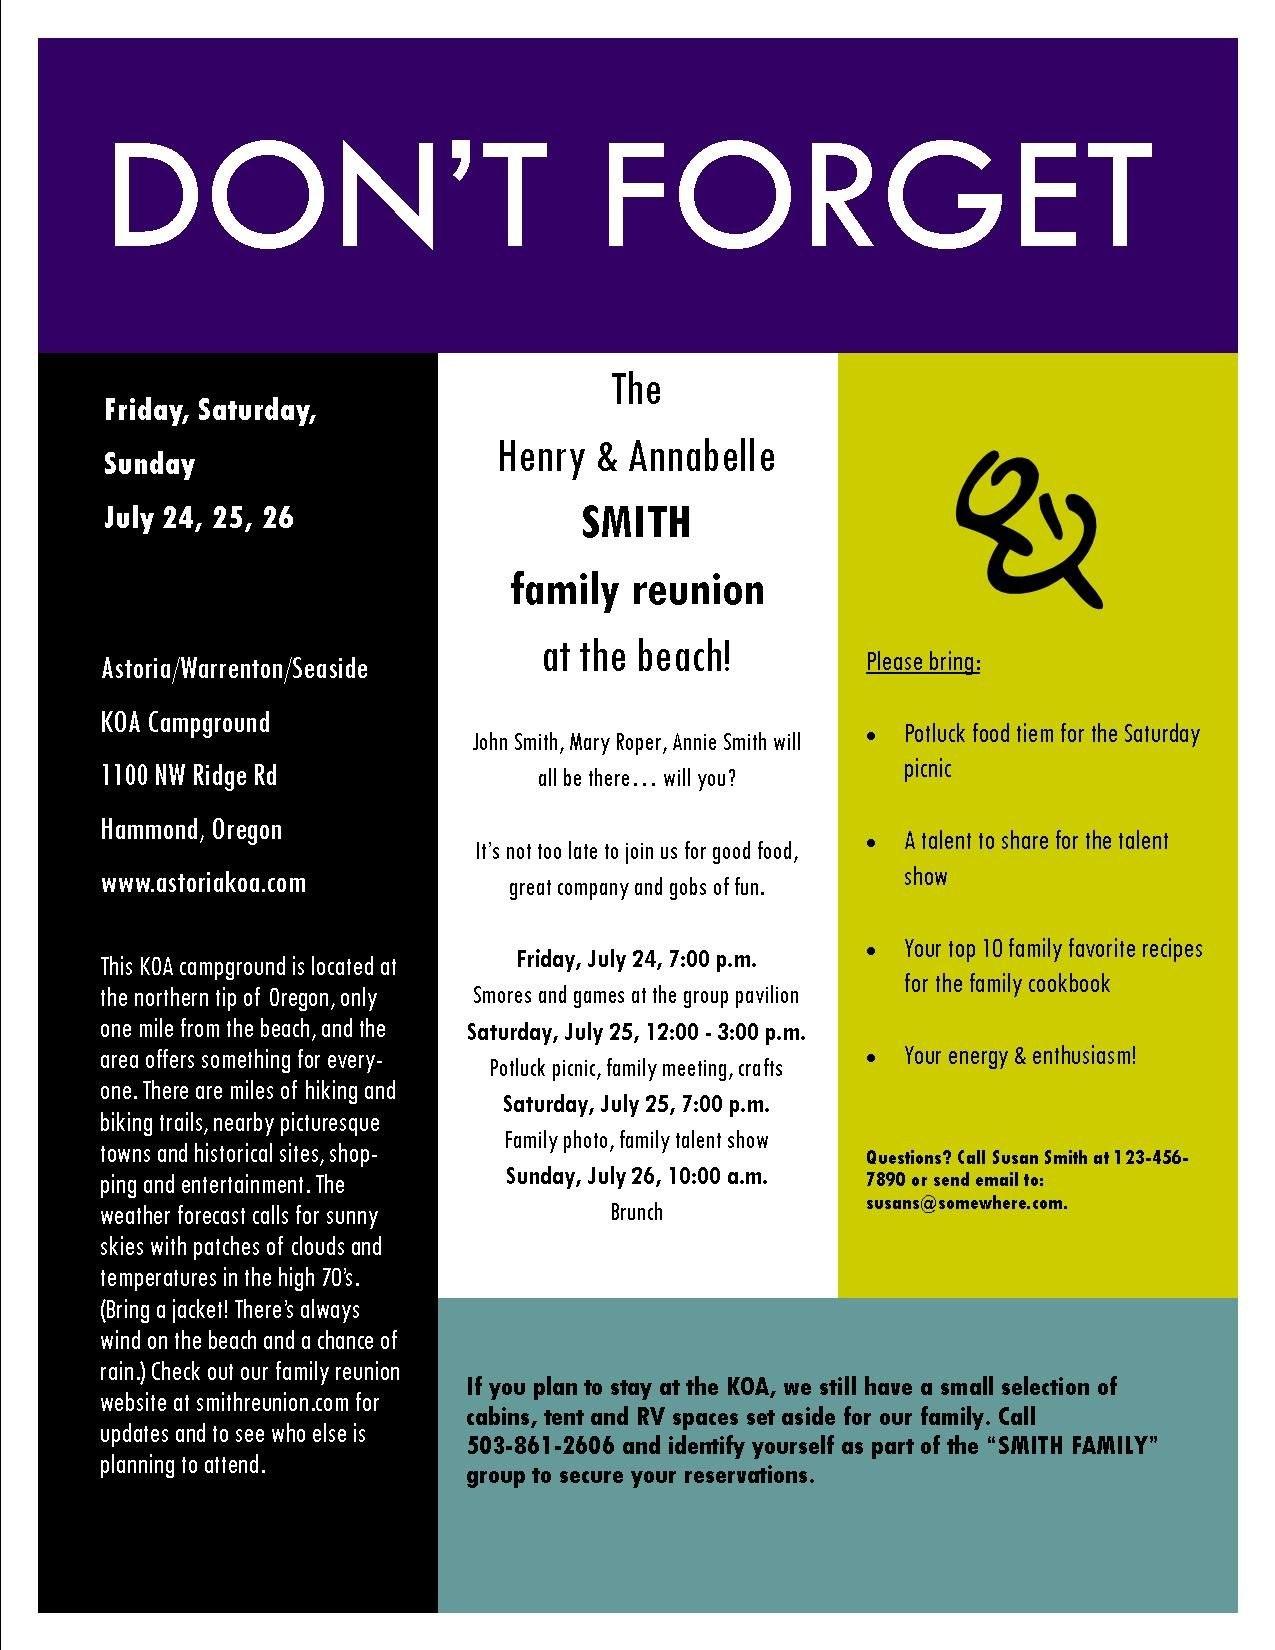 Sample Family Reunion Invitation Flyer  Ideas For Family Reunions With Reunion Invitation Card Templates